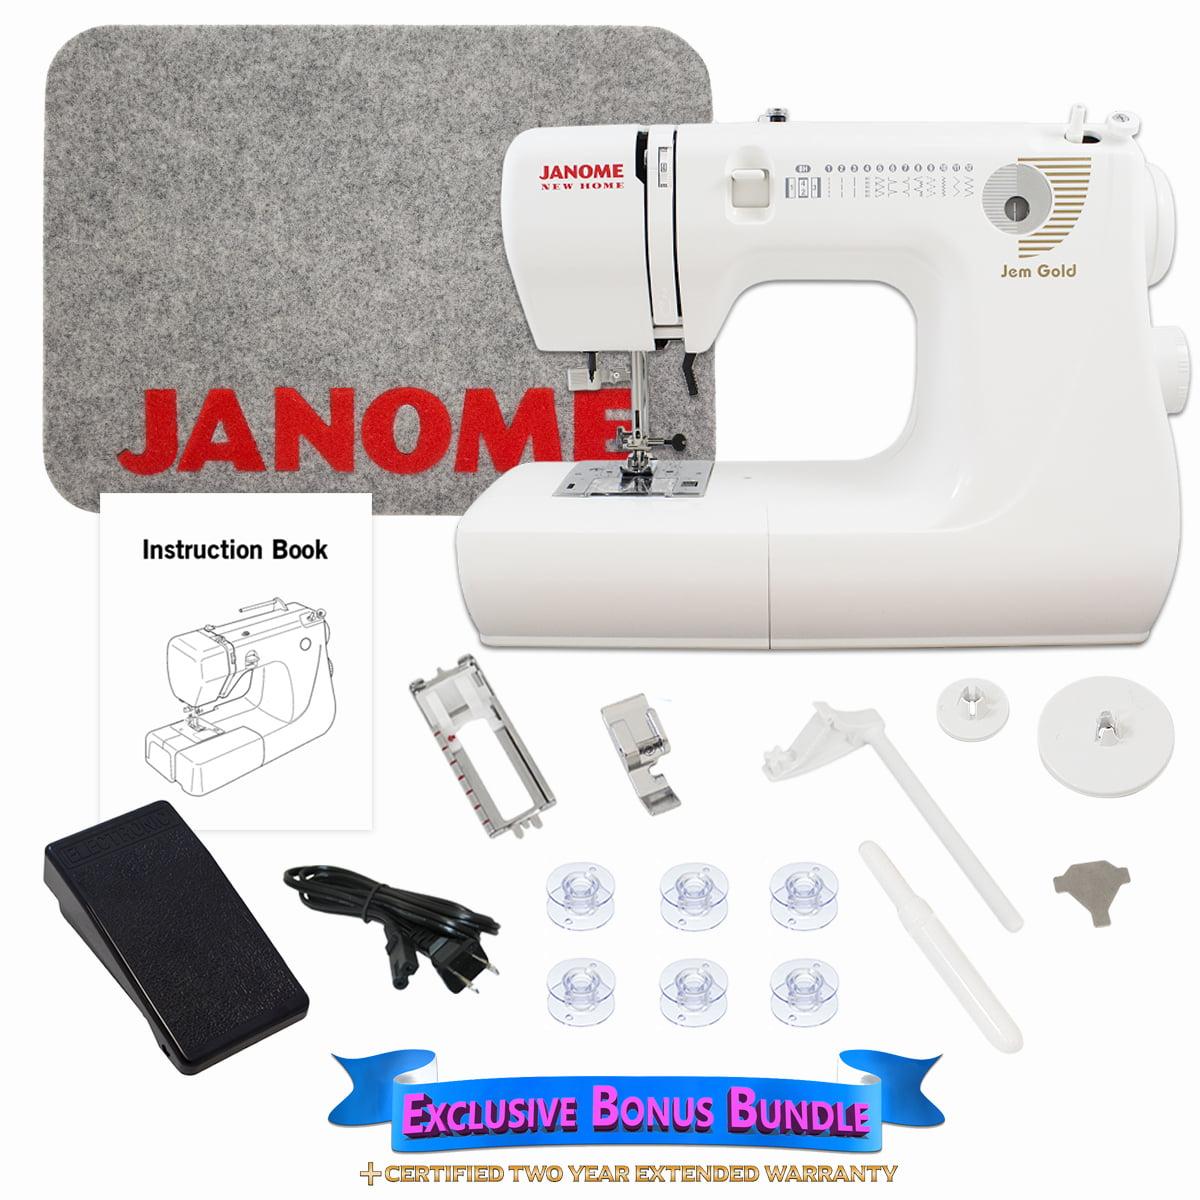 Janome Jem Gold 660 Sewing Machine Includes Exclusive Bonus Bundle